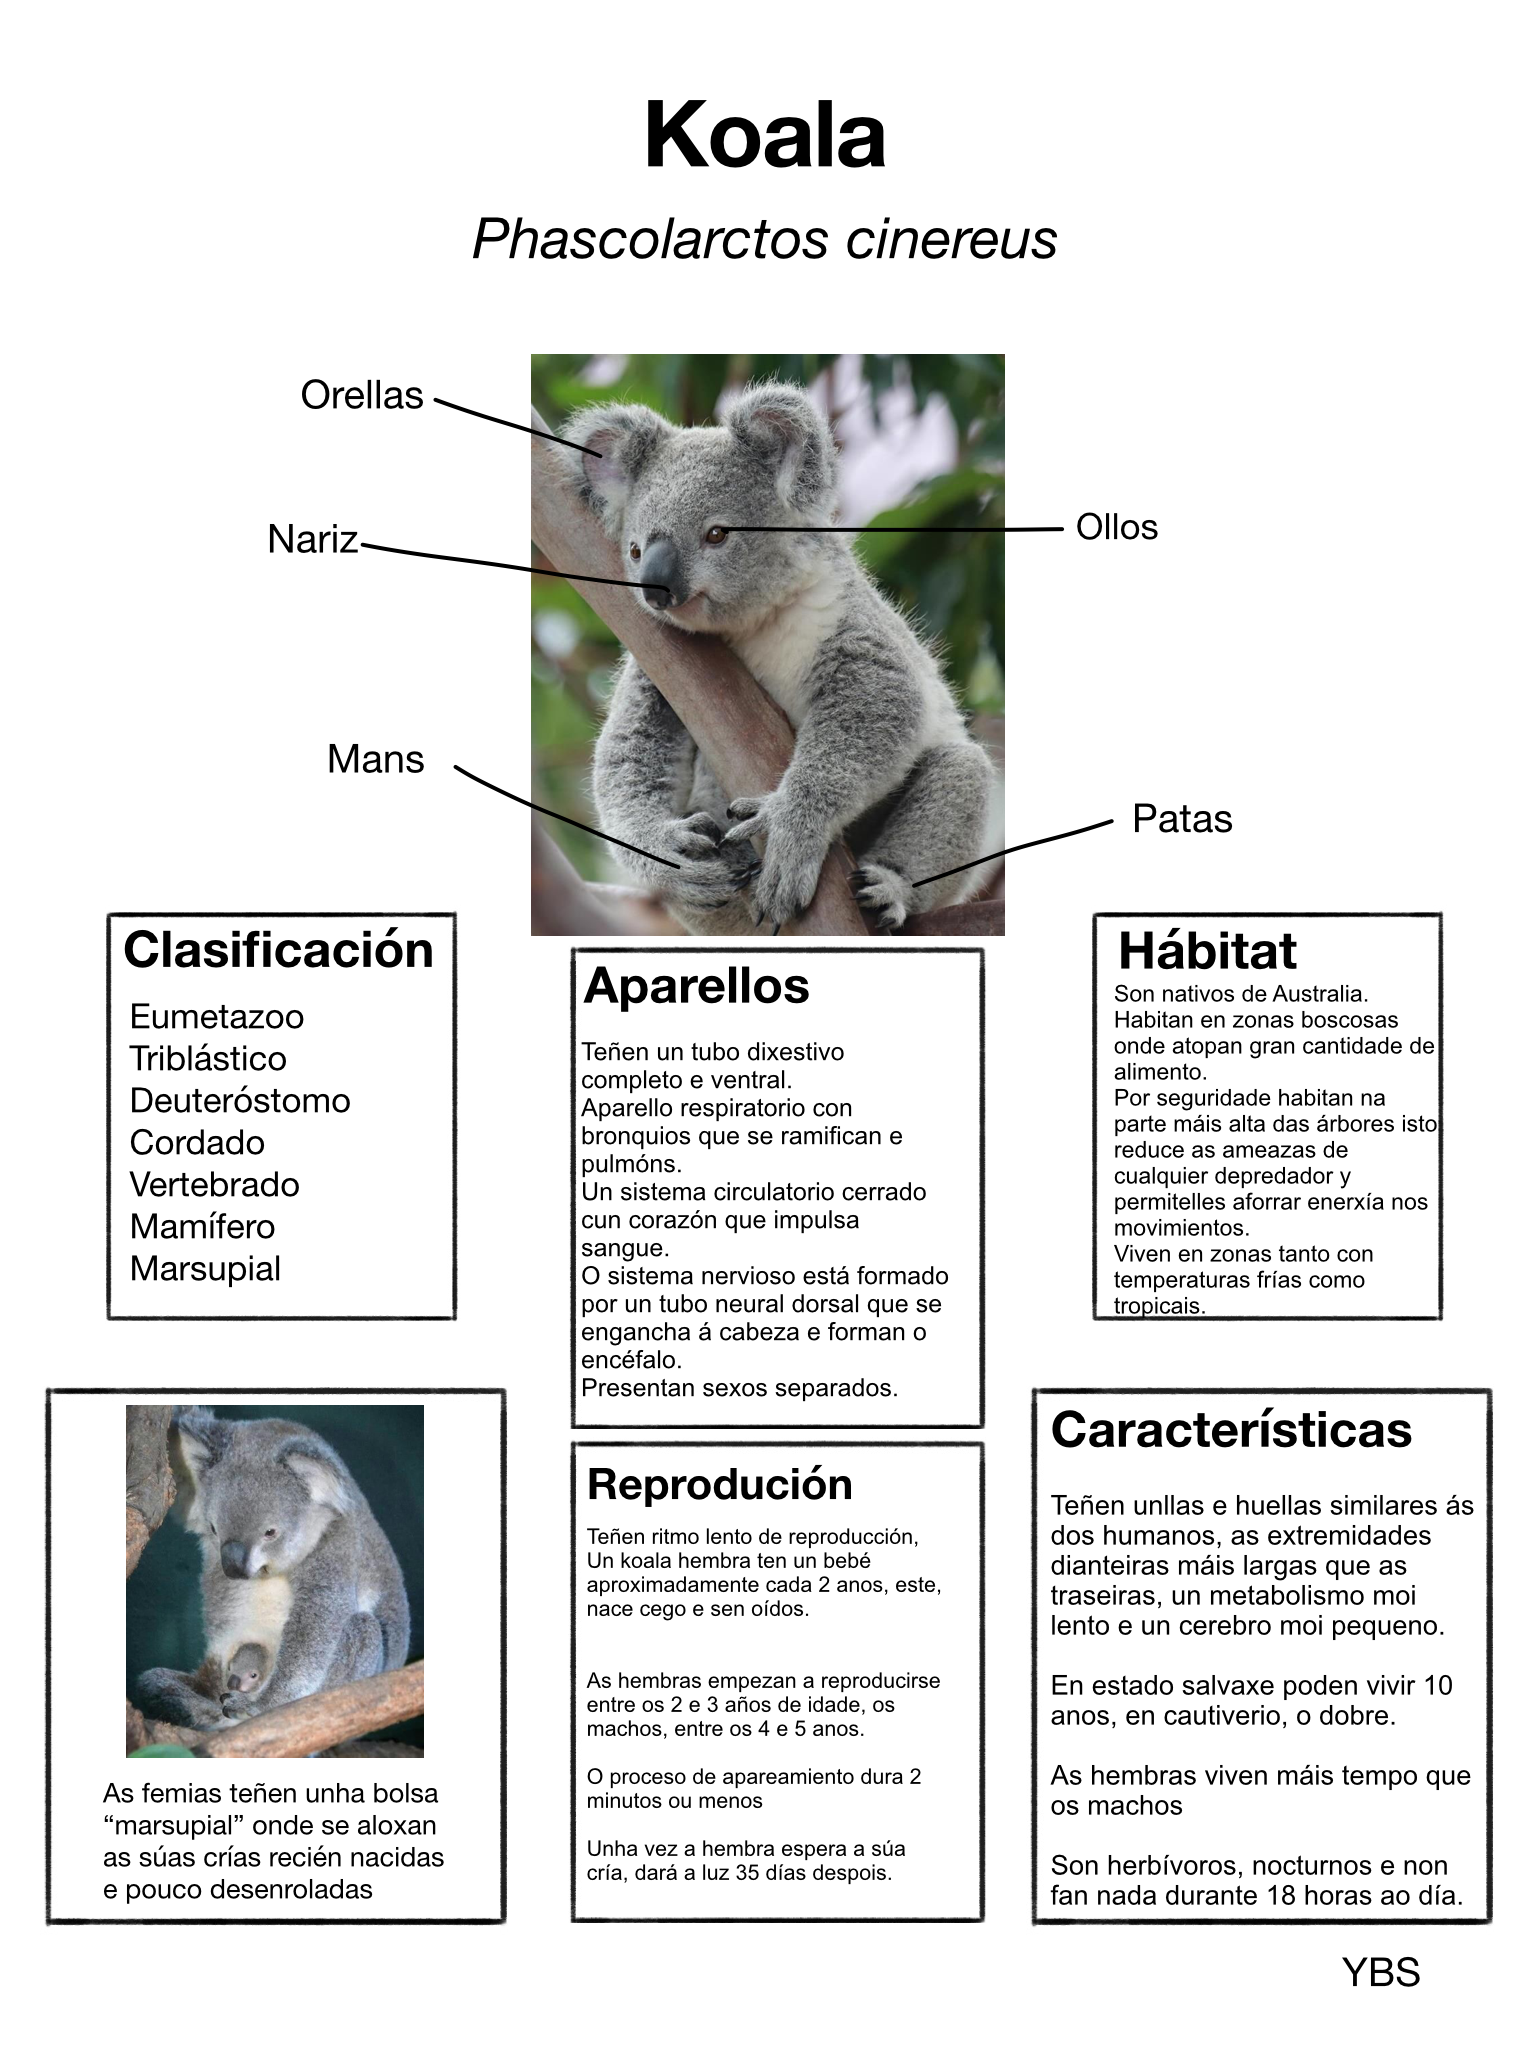 Blanco Y - koala